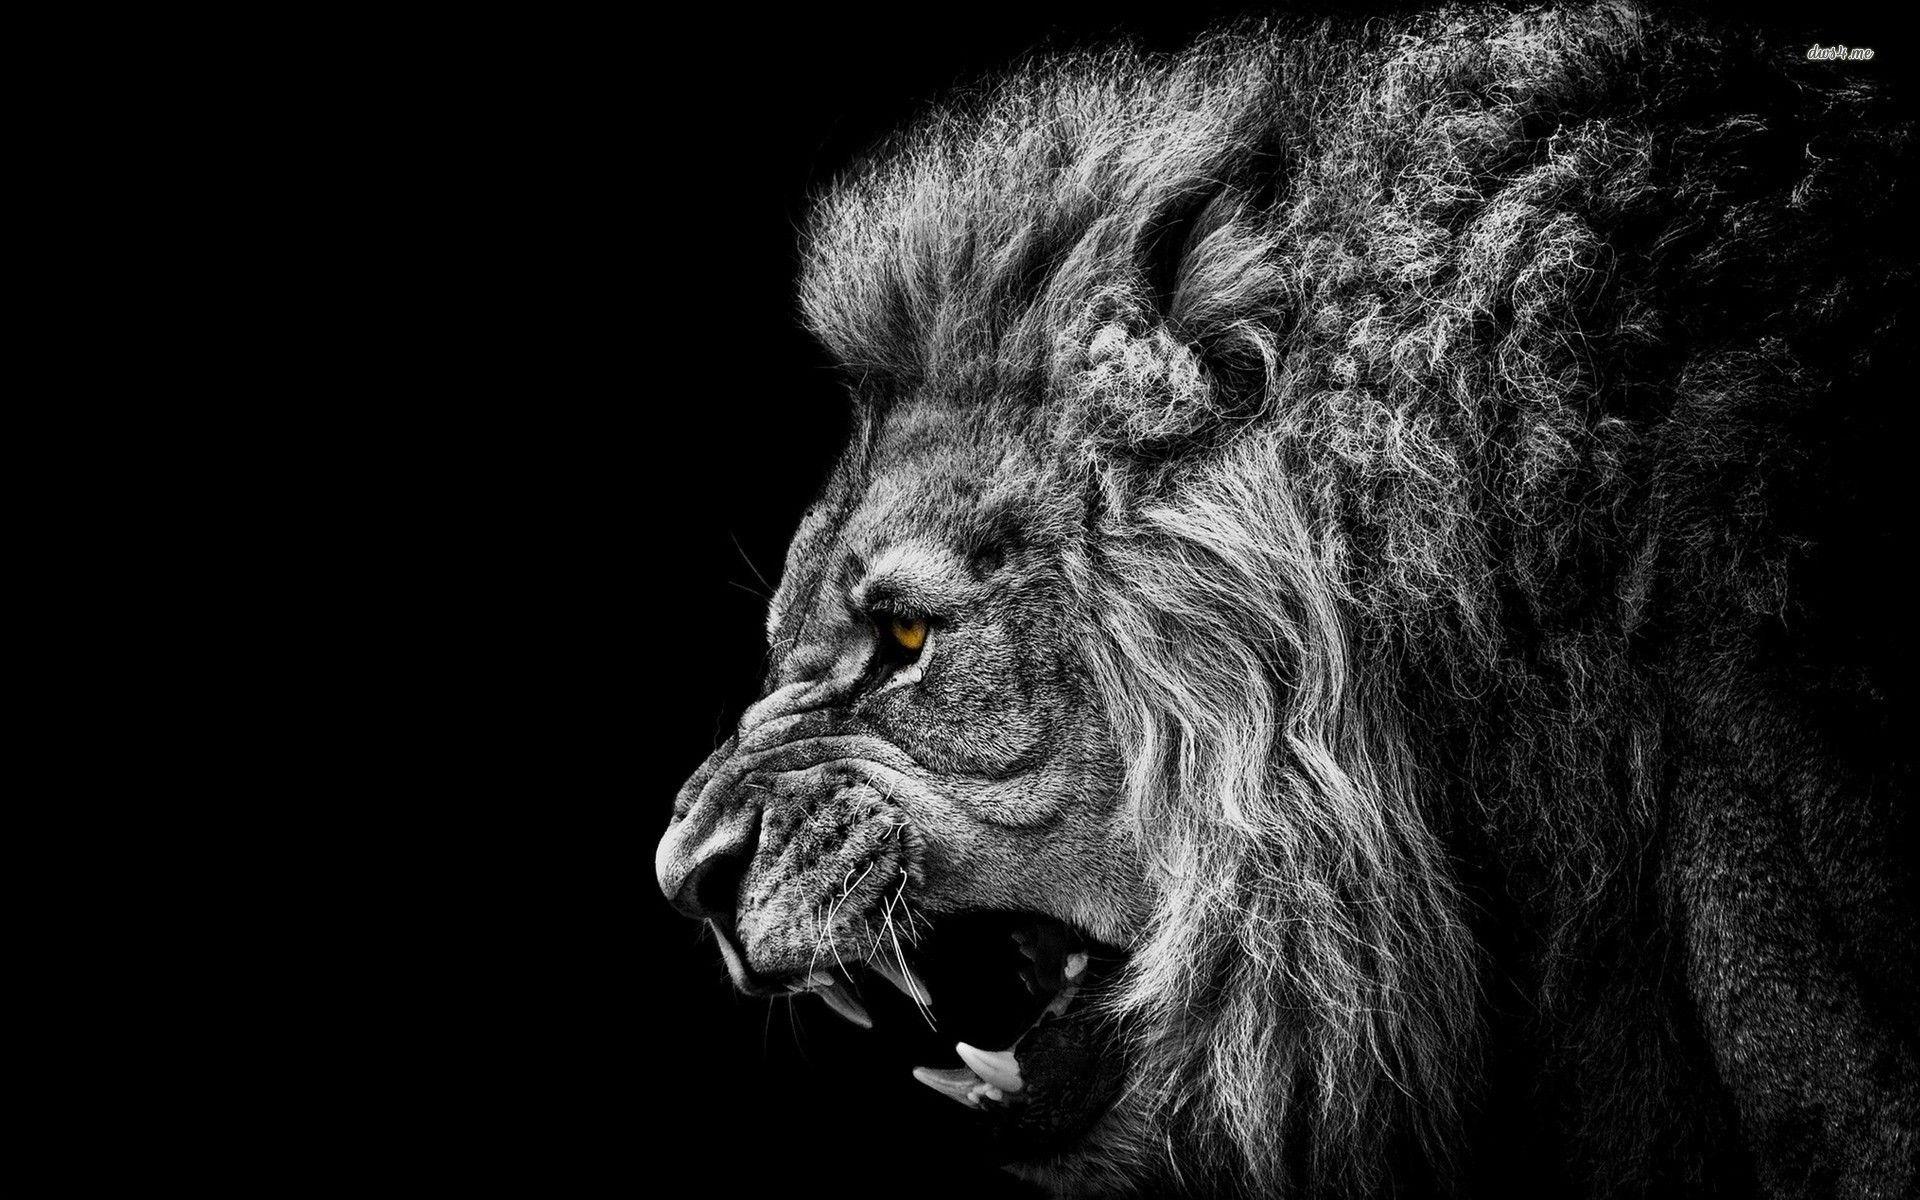 lion wallpaper Google keresés imagens) Leão feroz